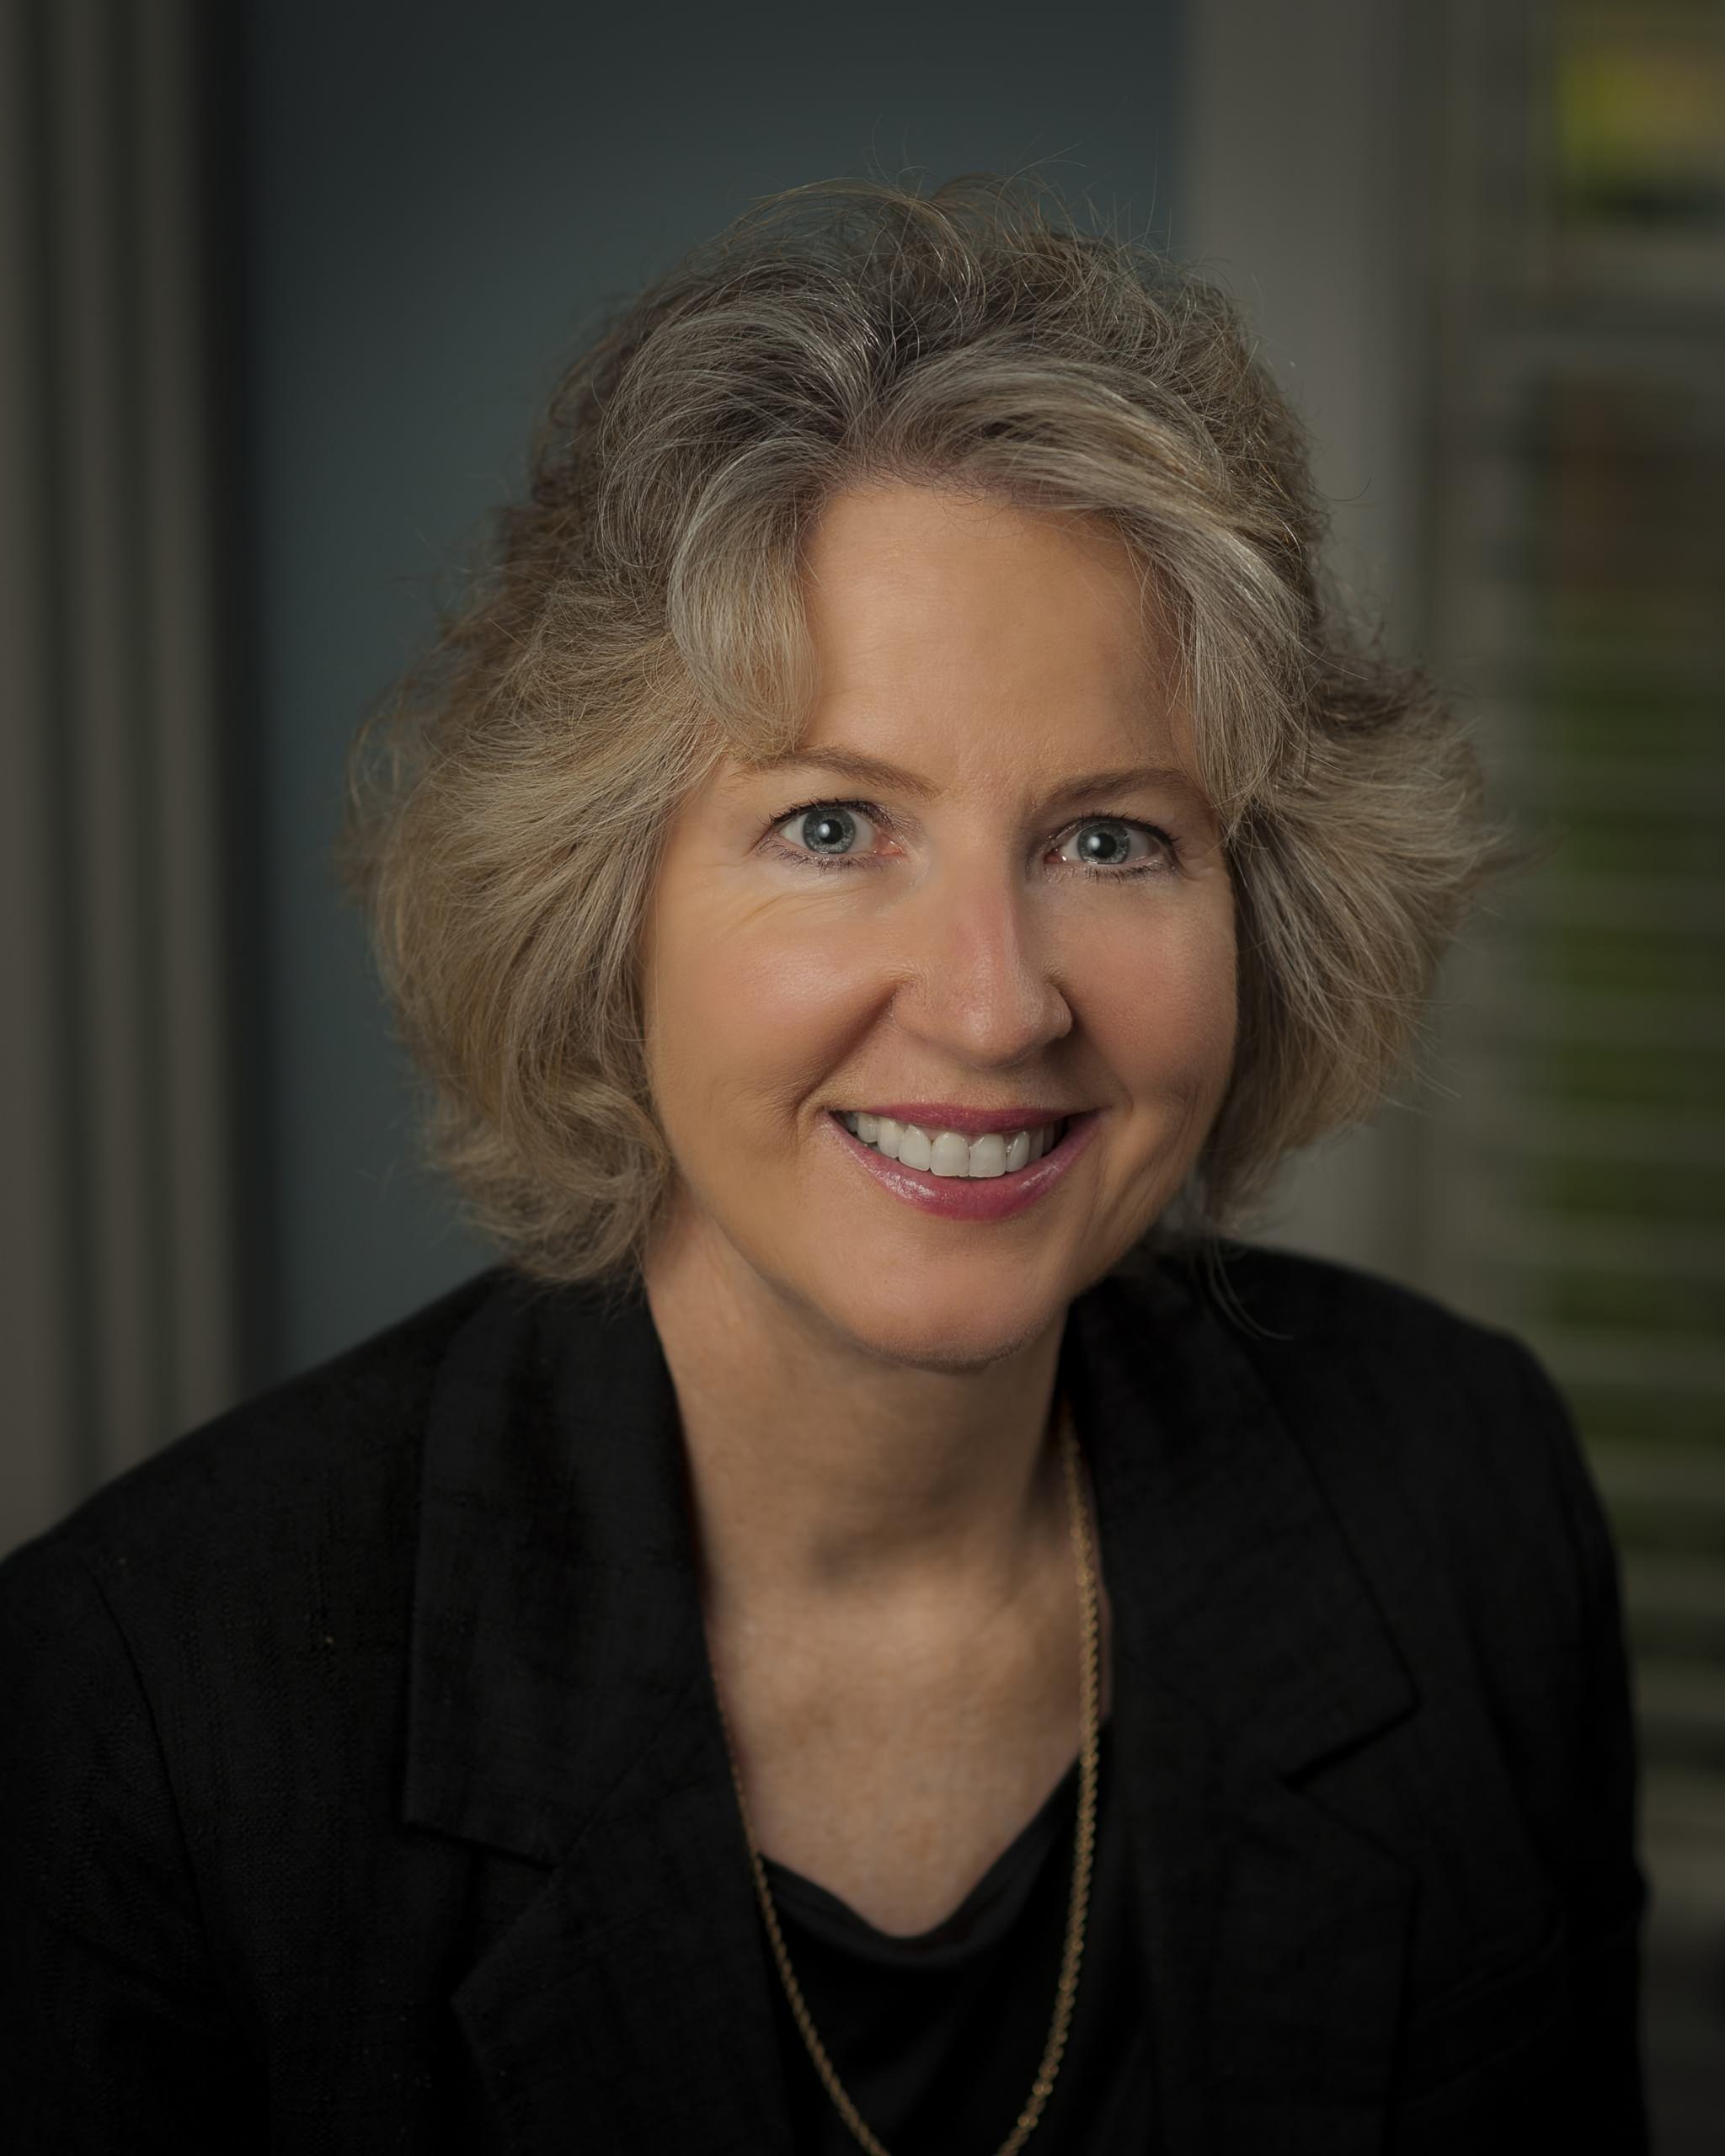 Marian Profile Image